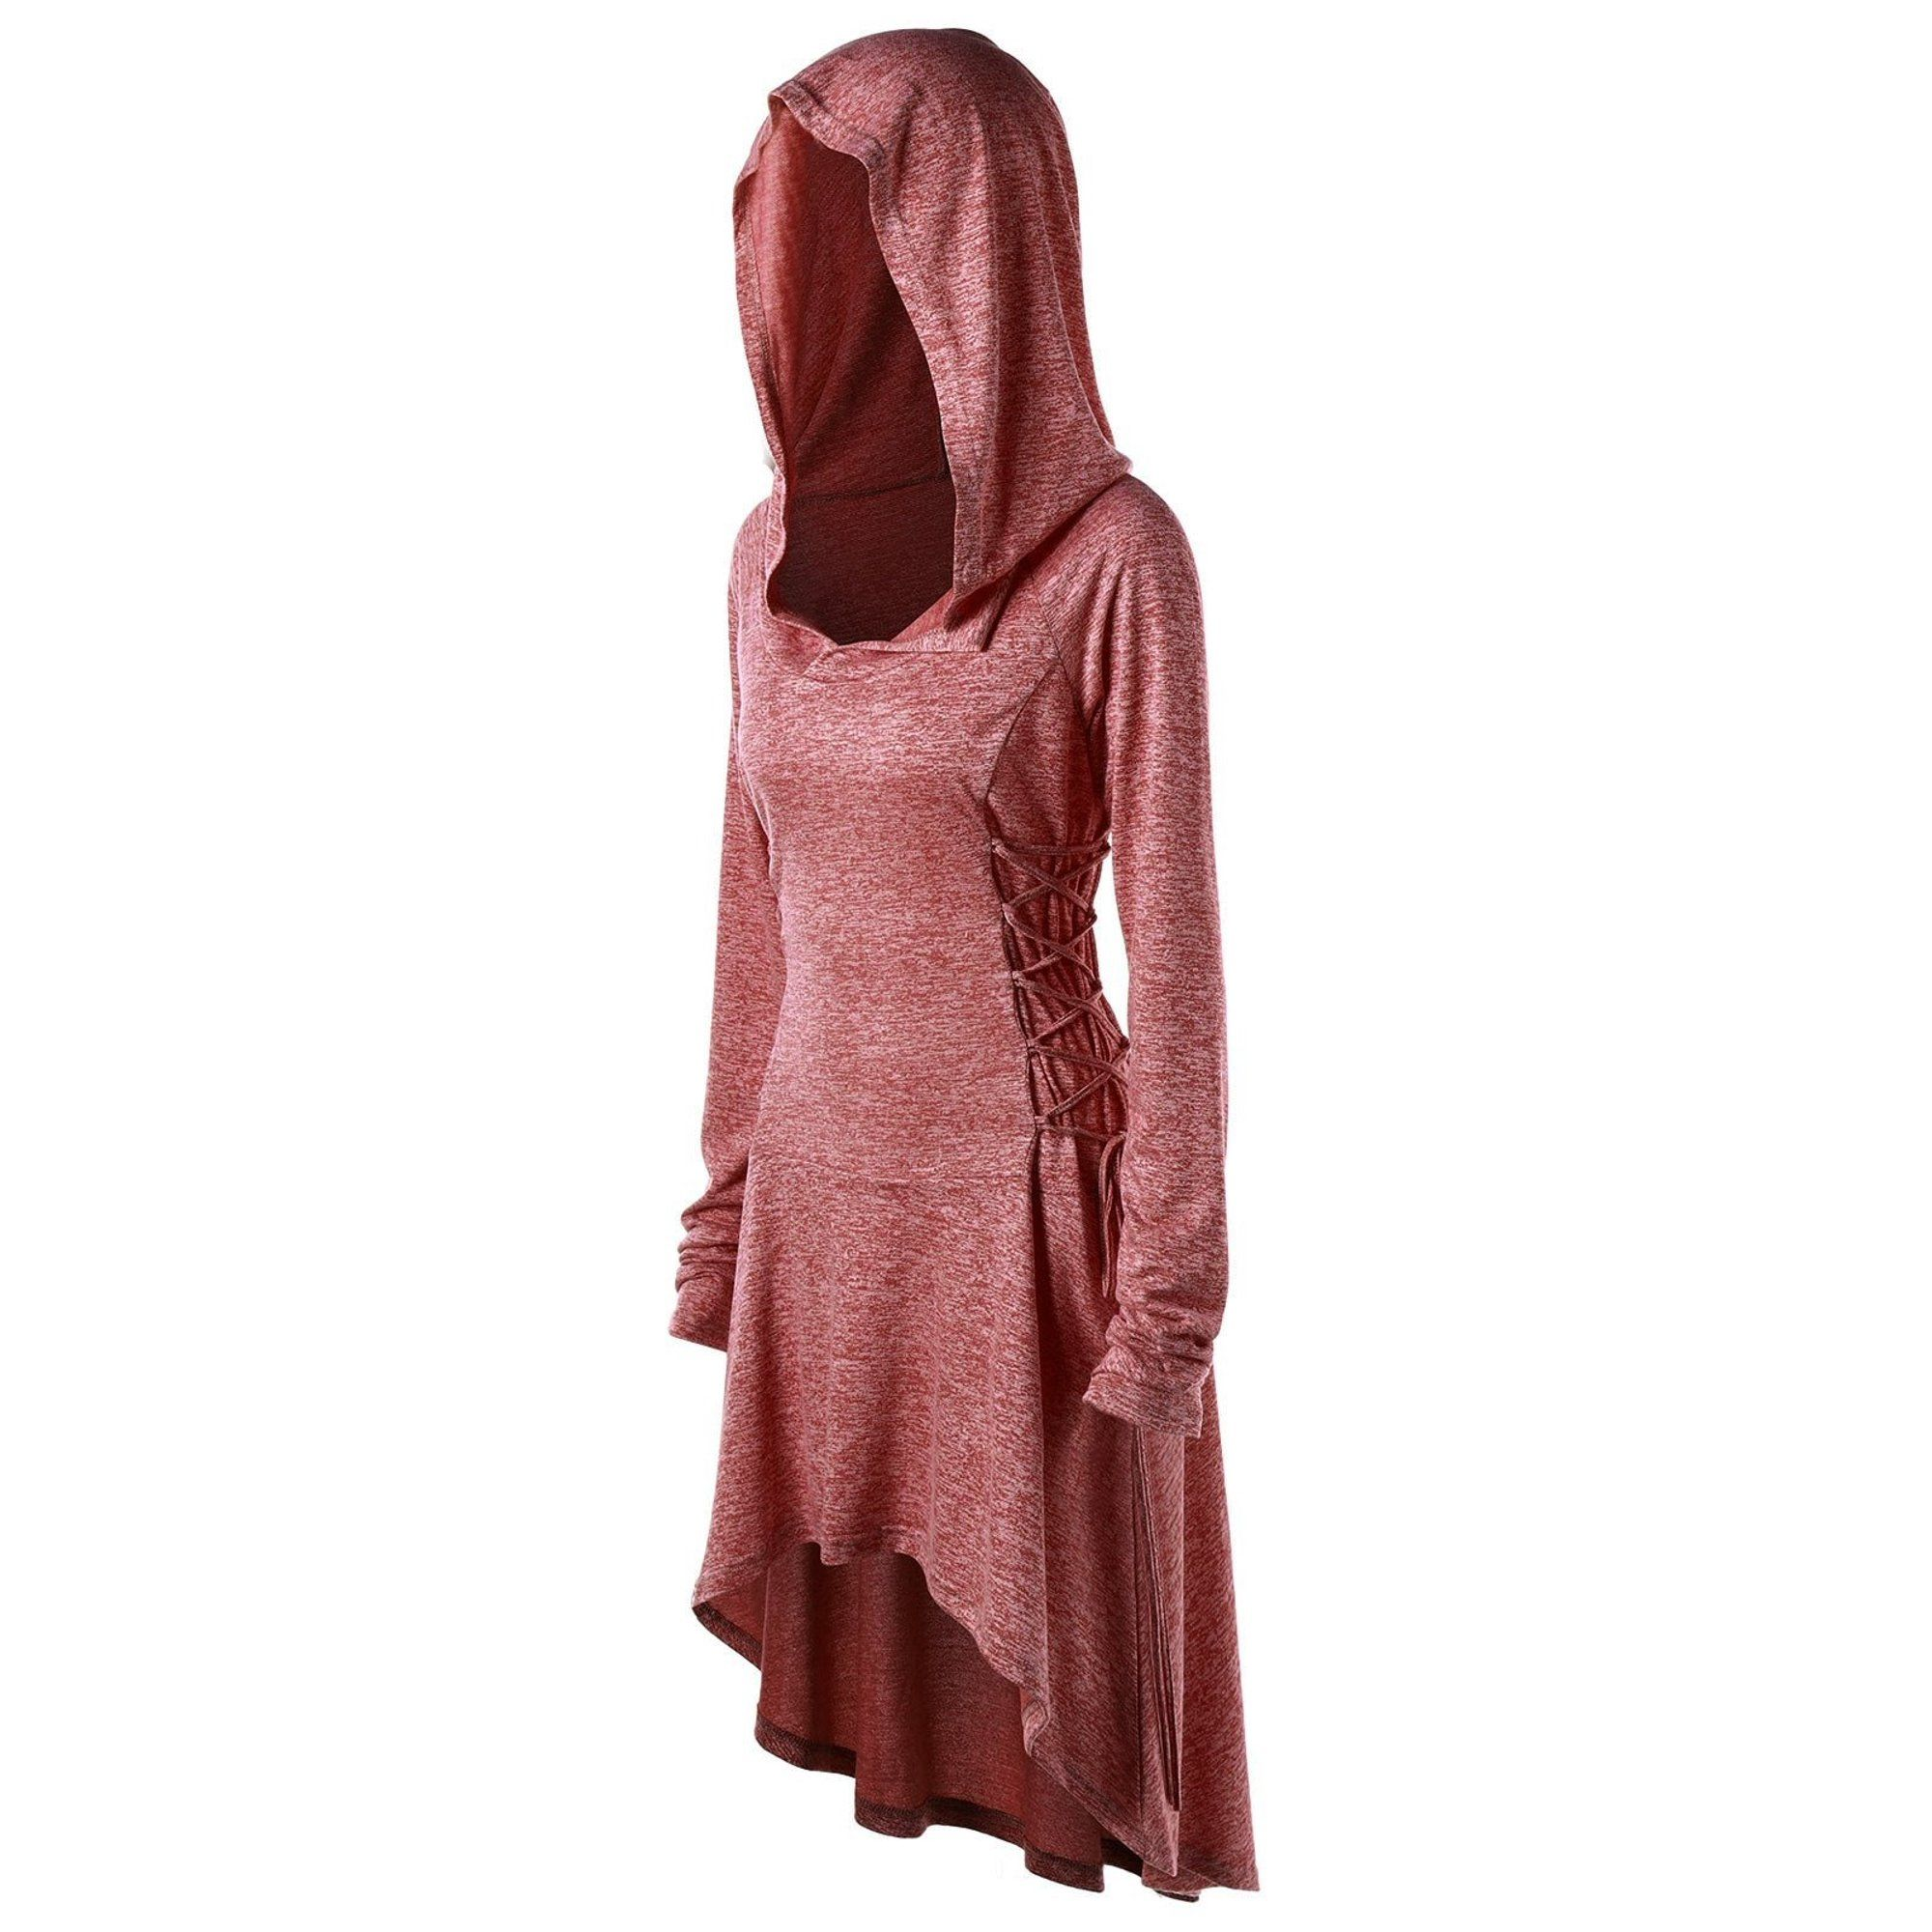 Sysea Women Long Sleeve Irregular Hem Long Tops Casual Hooded Dress Walmart Com In 2021 Big Size Outfit Fashion Solid Color Dress [ 2000 x 2000 Pixel ]